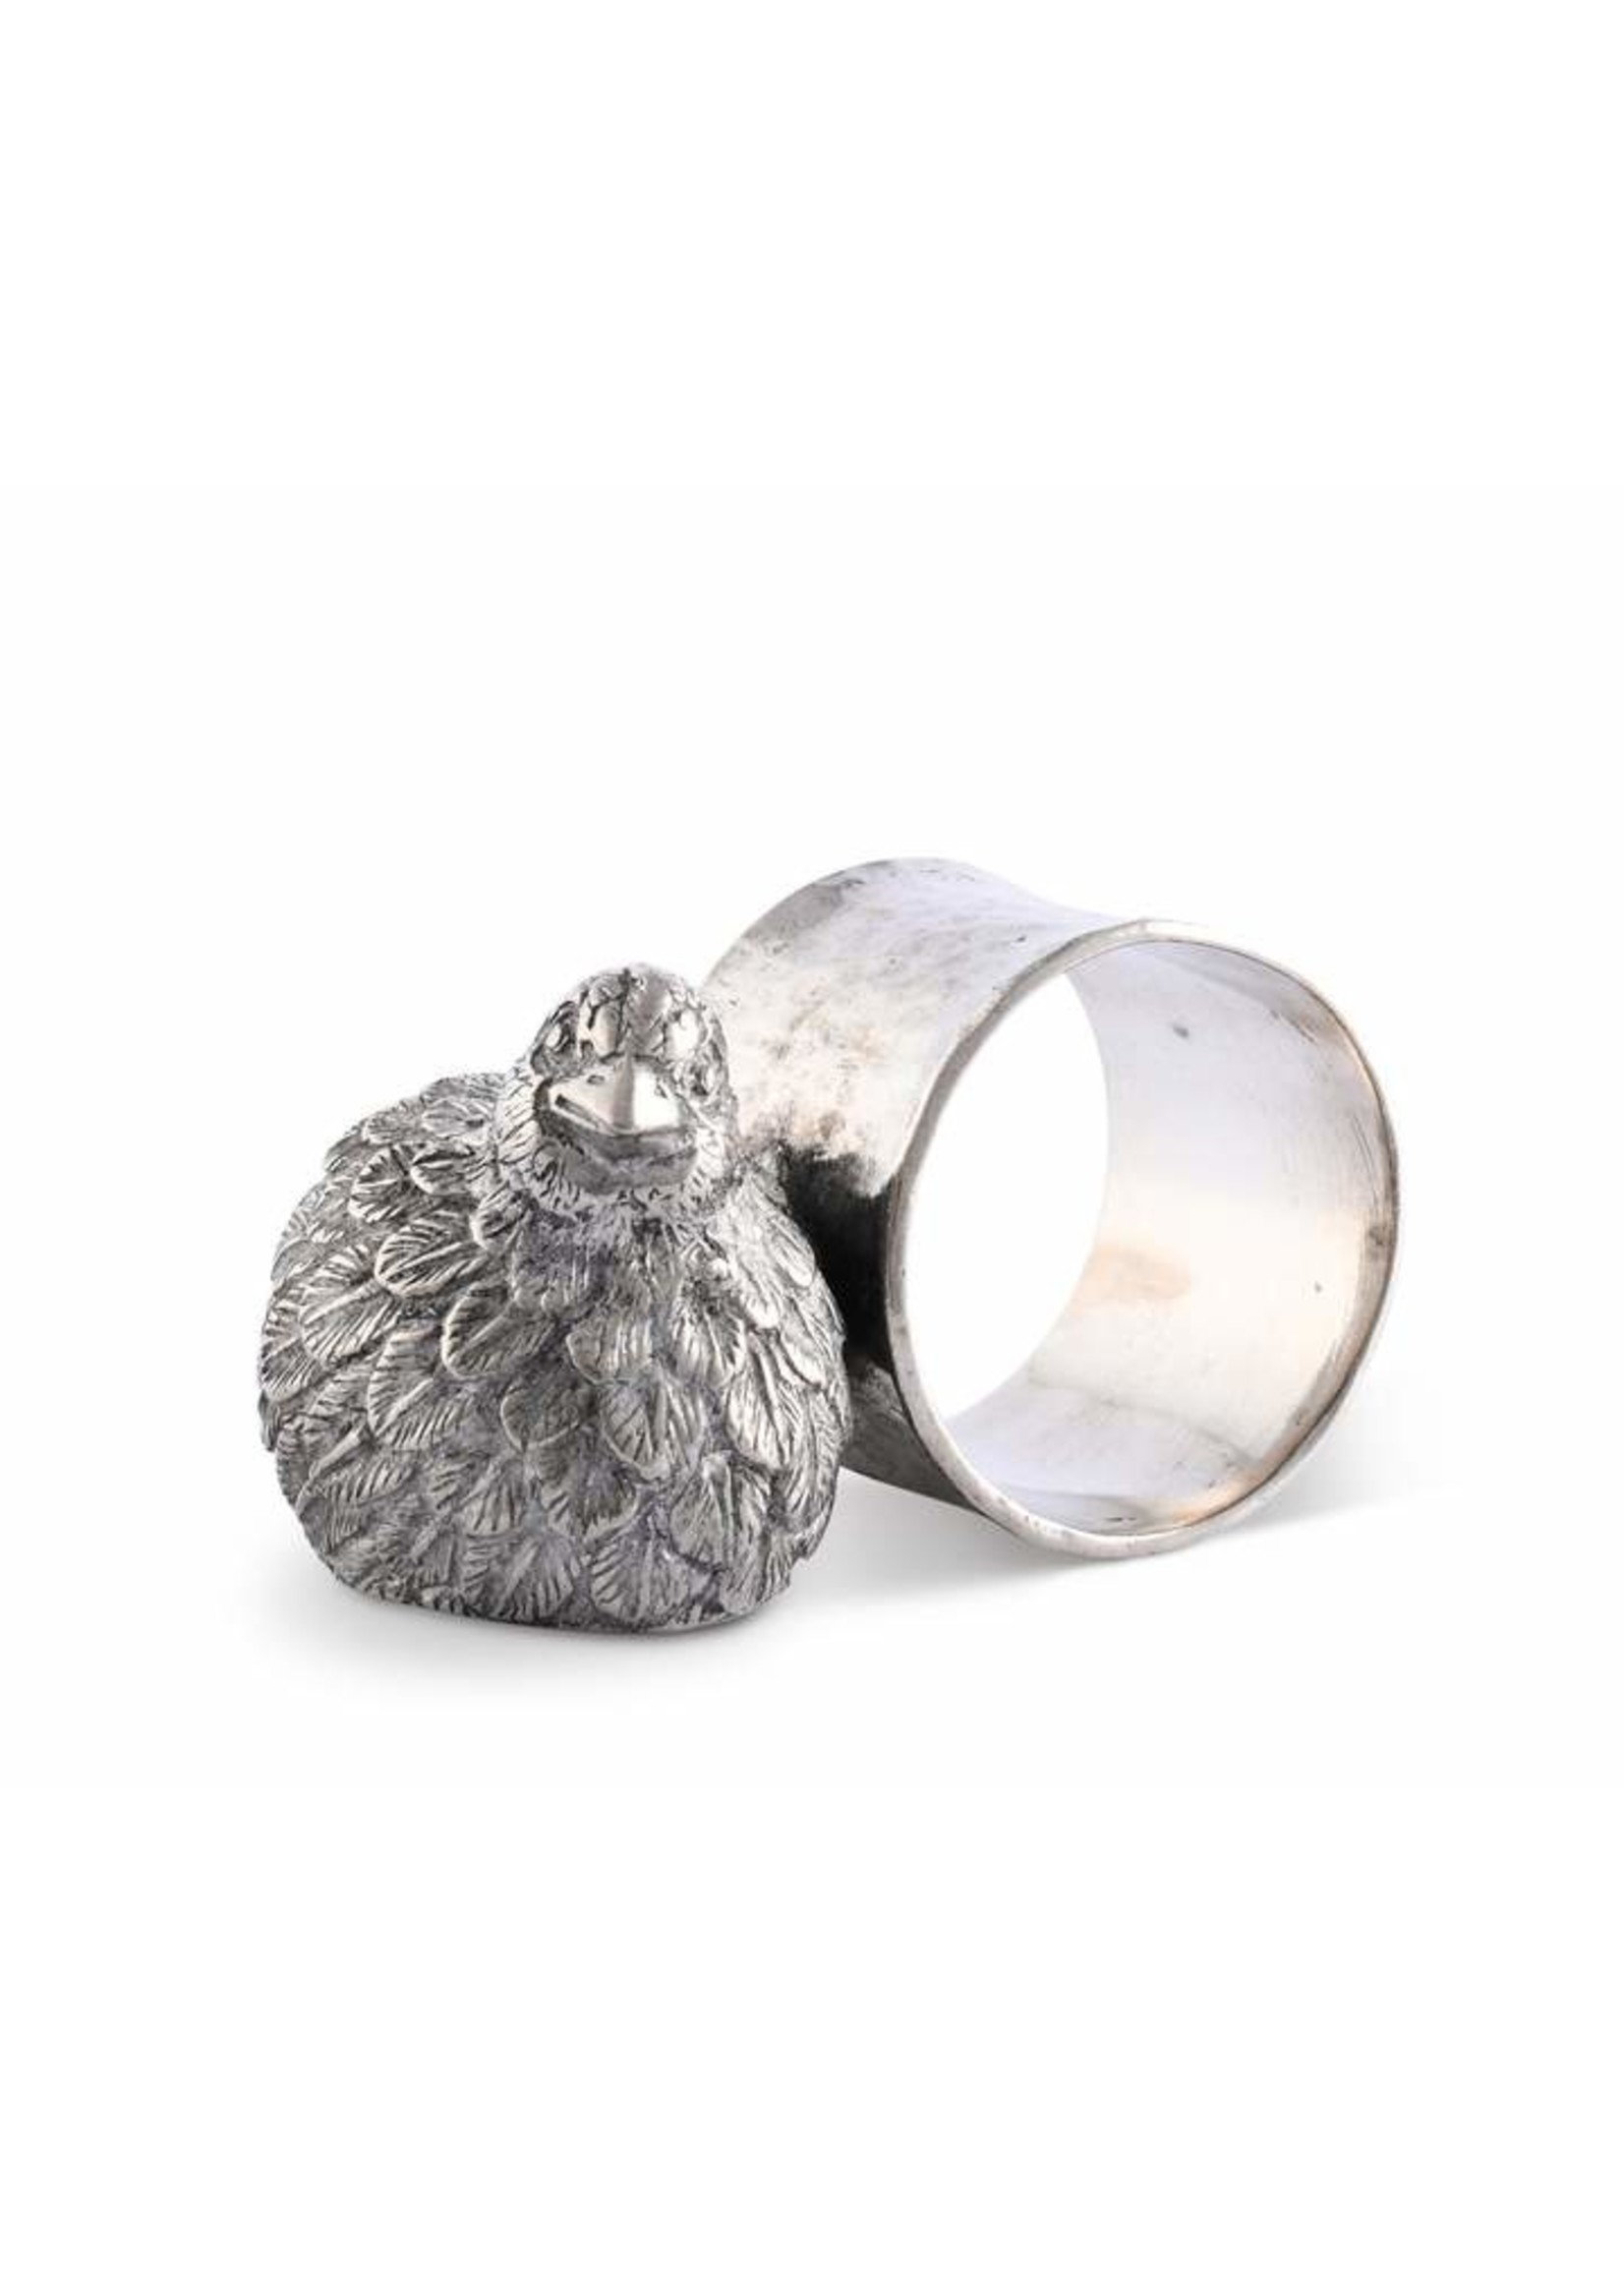 Napkin Ring - Quail